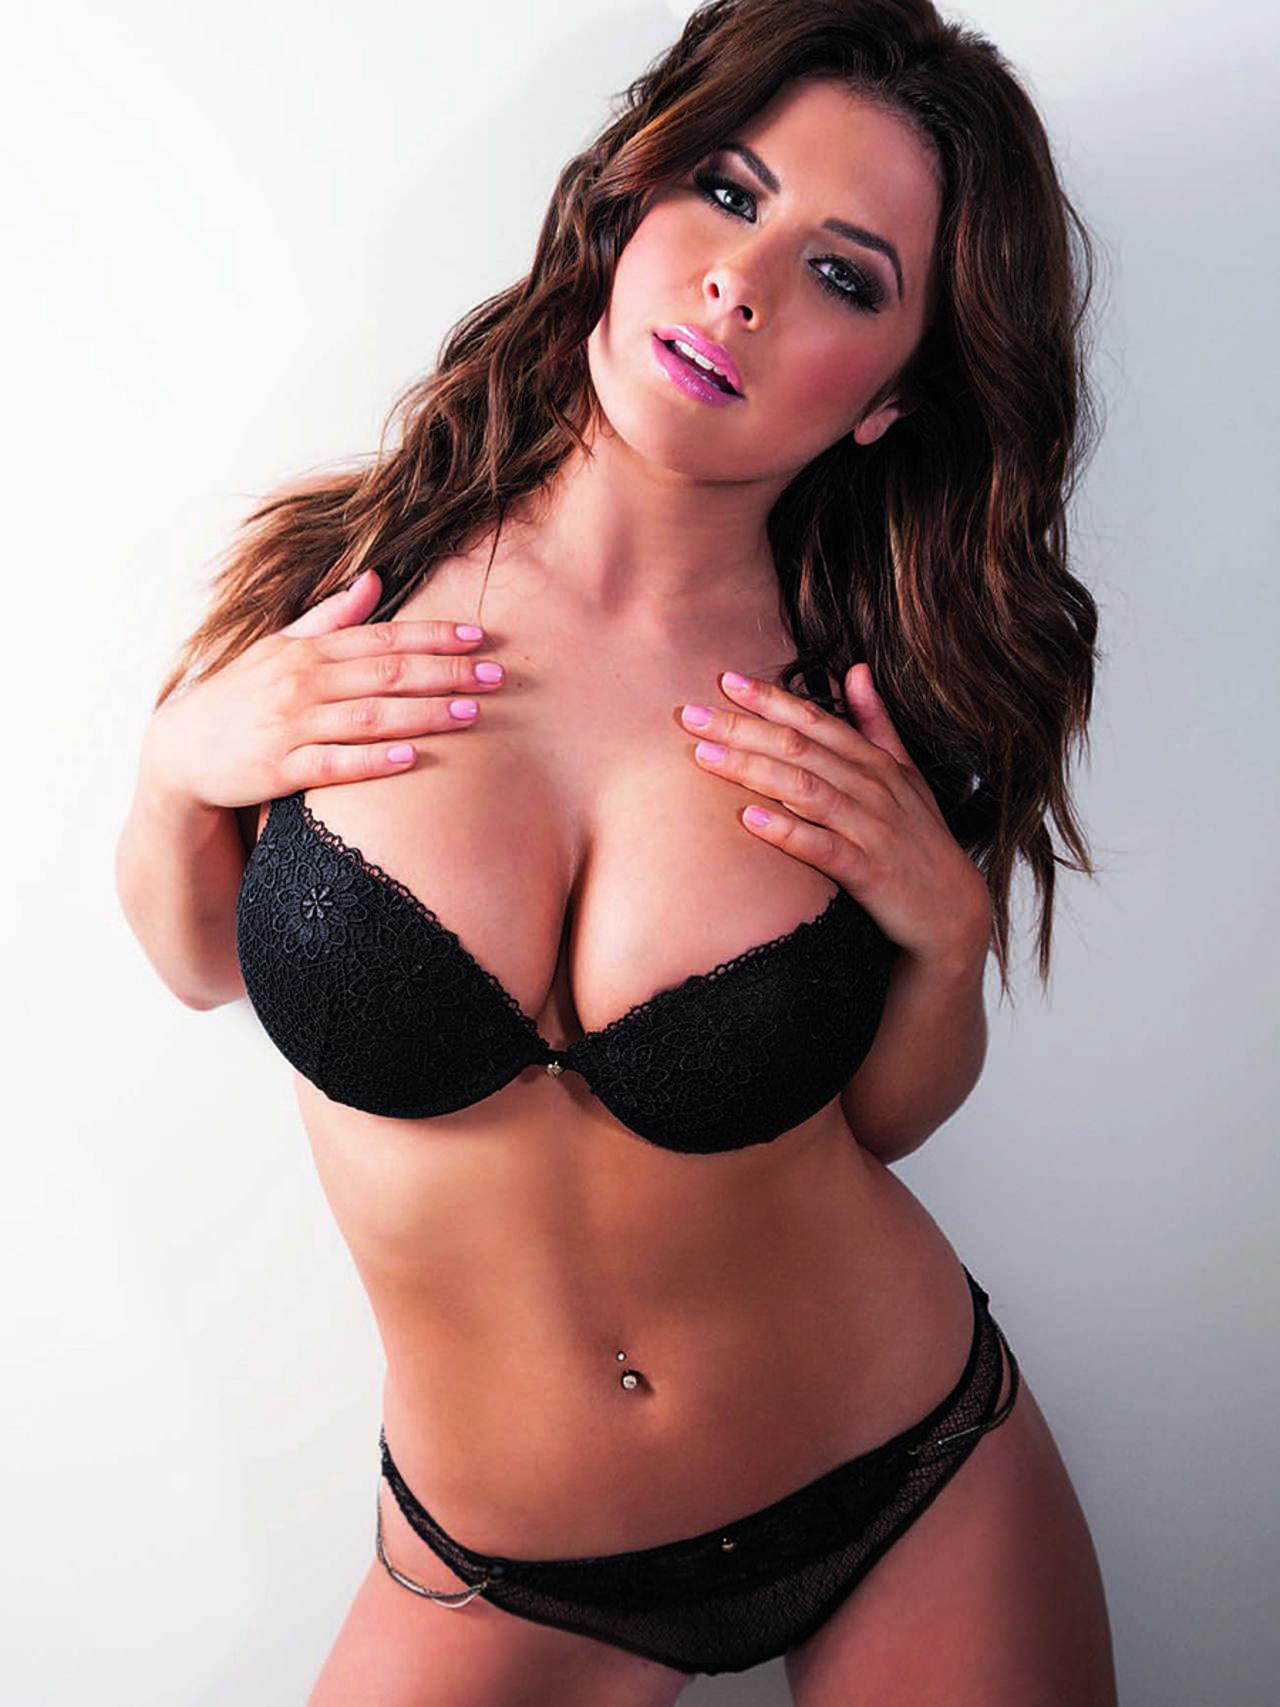 Kelly Hall nudes (13 photo) Boobs, iCloud, butt